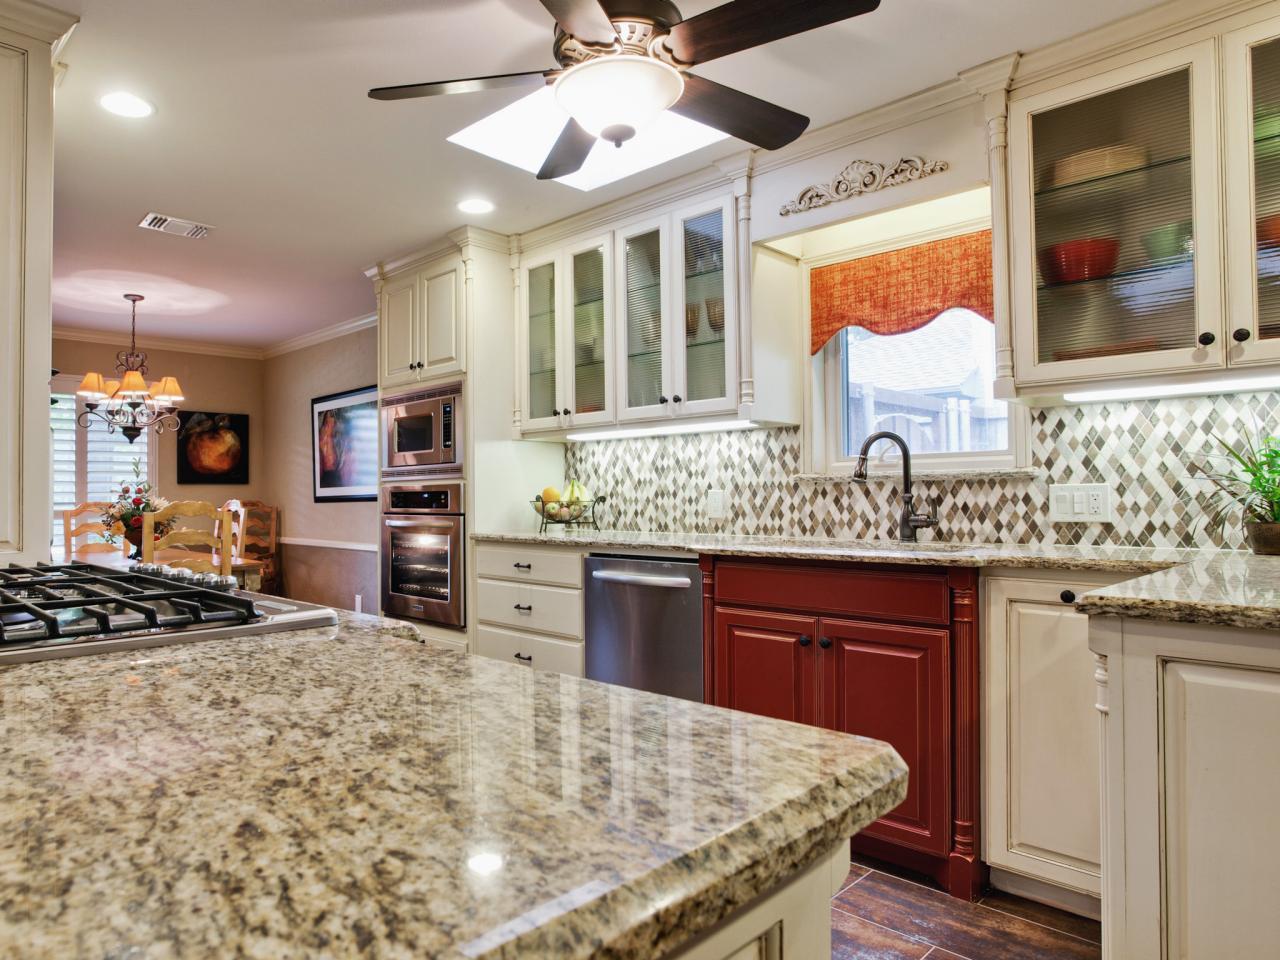 Cute Backsplash Ideas for Granite Countertops kitchen counters and backsplash